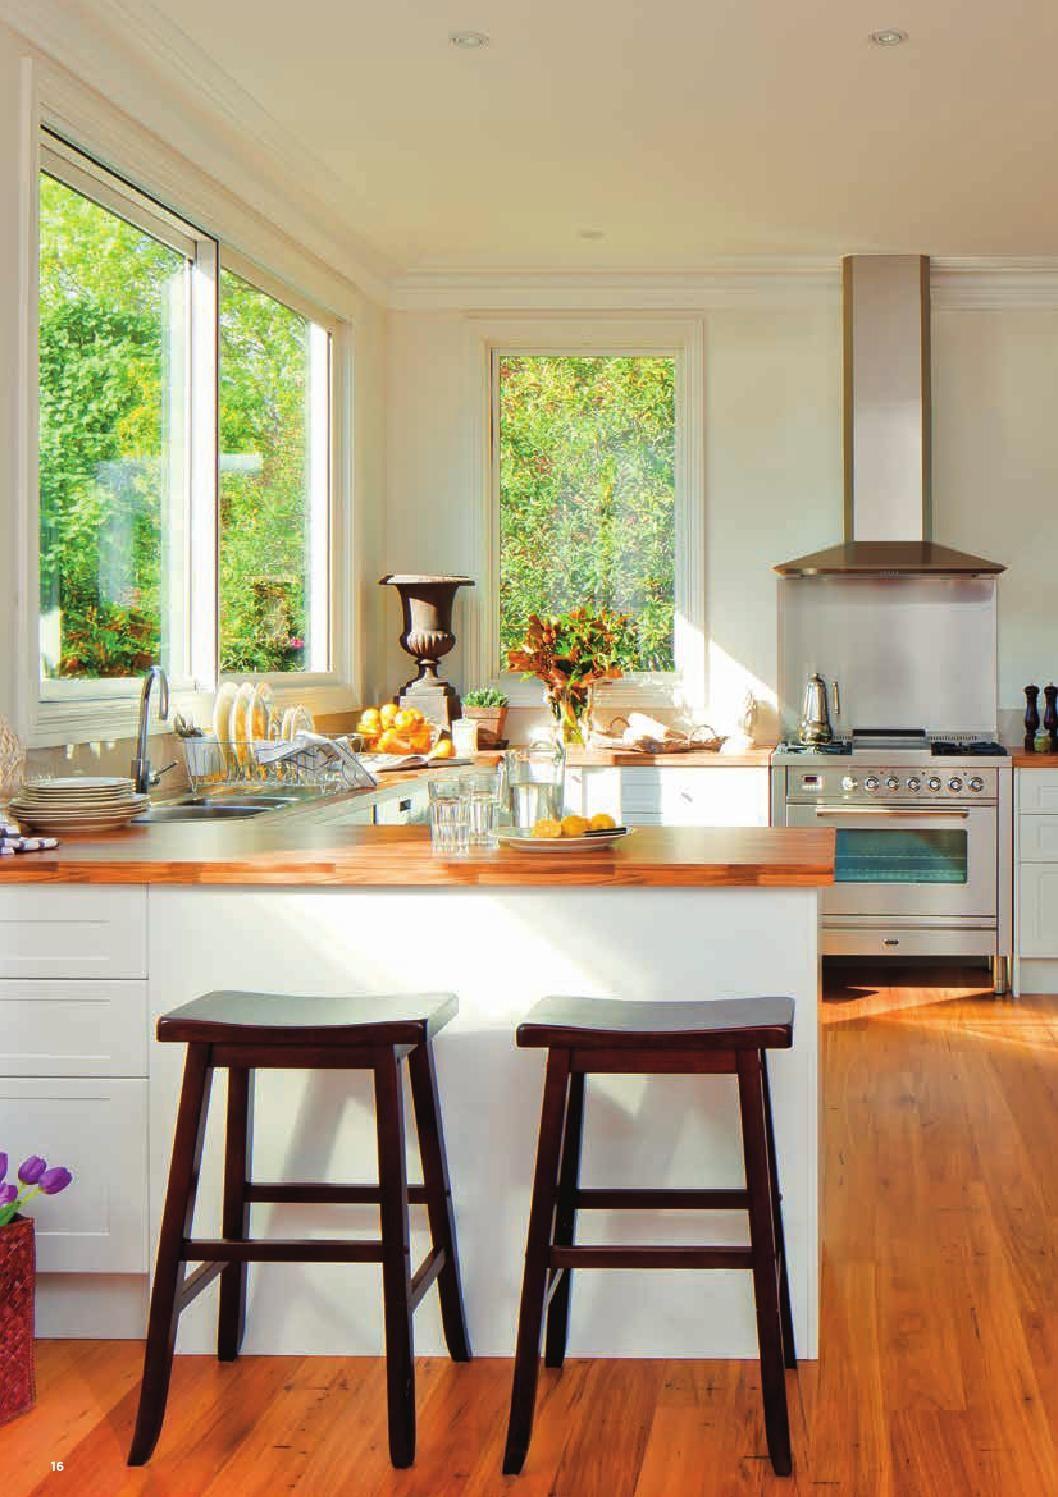 kaboodle kitchen australian catalogue kitchen tiles country kitchen designs kitchen pantry on kaboodle kitchen design id=37096